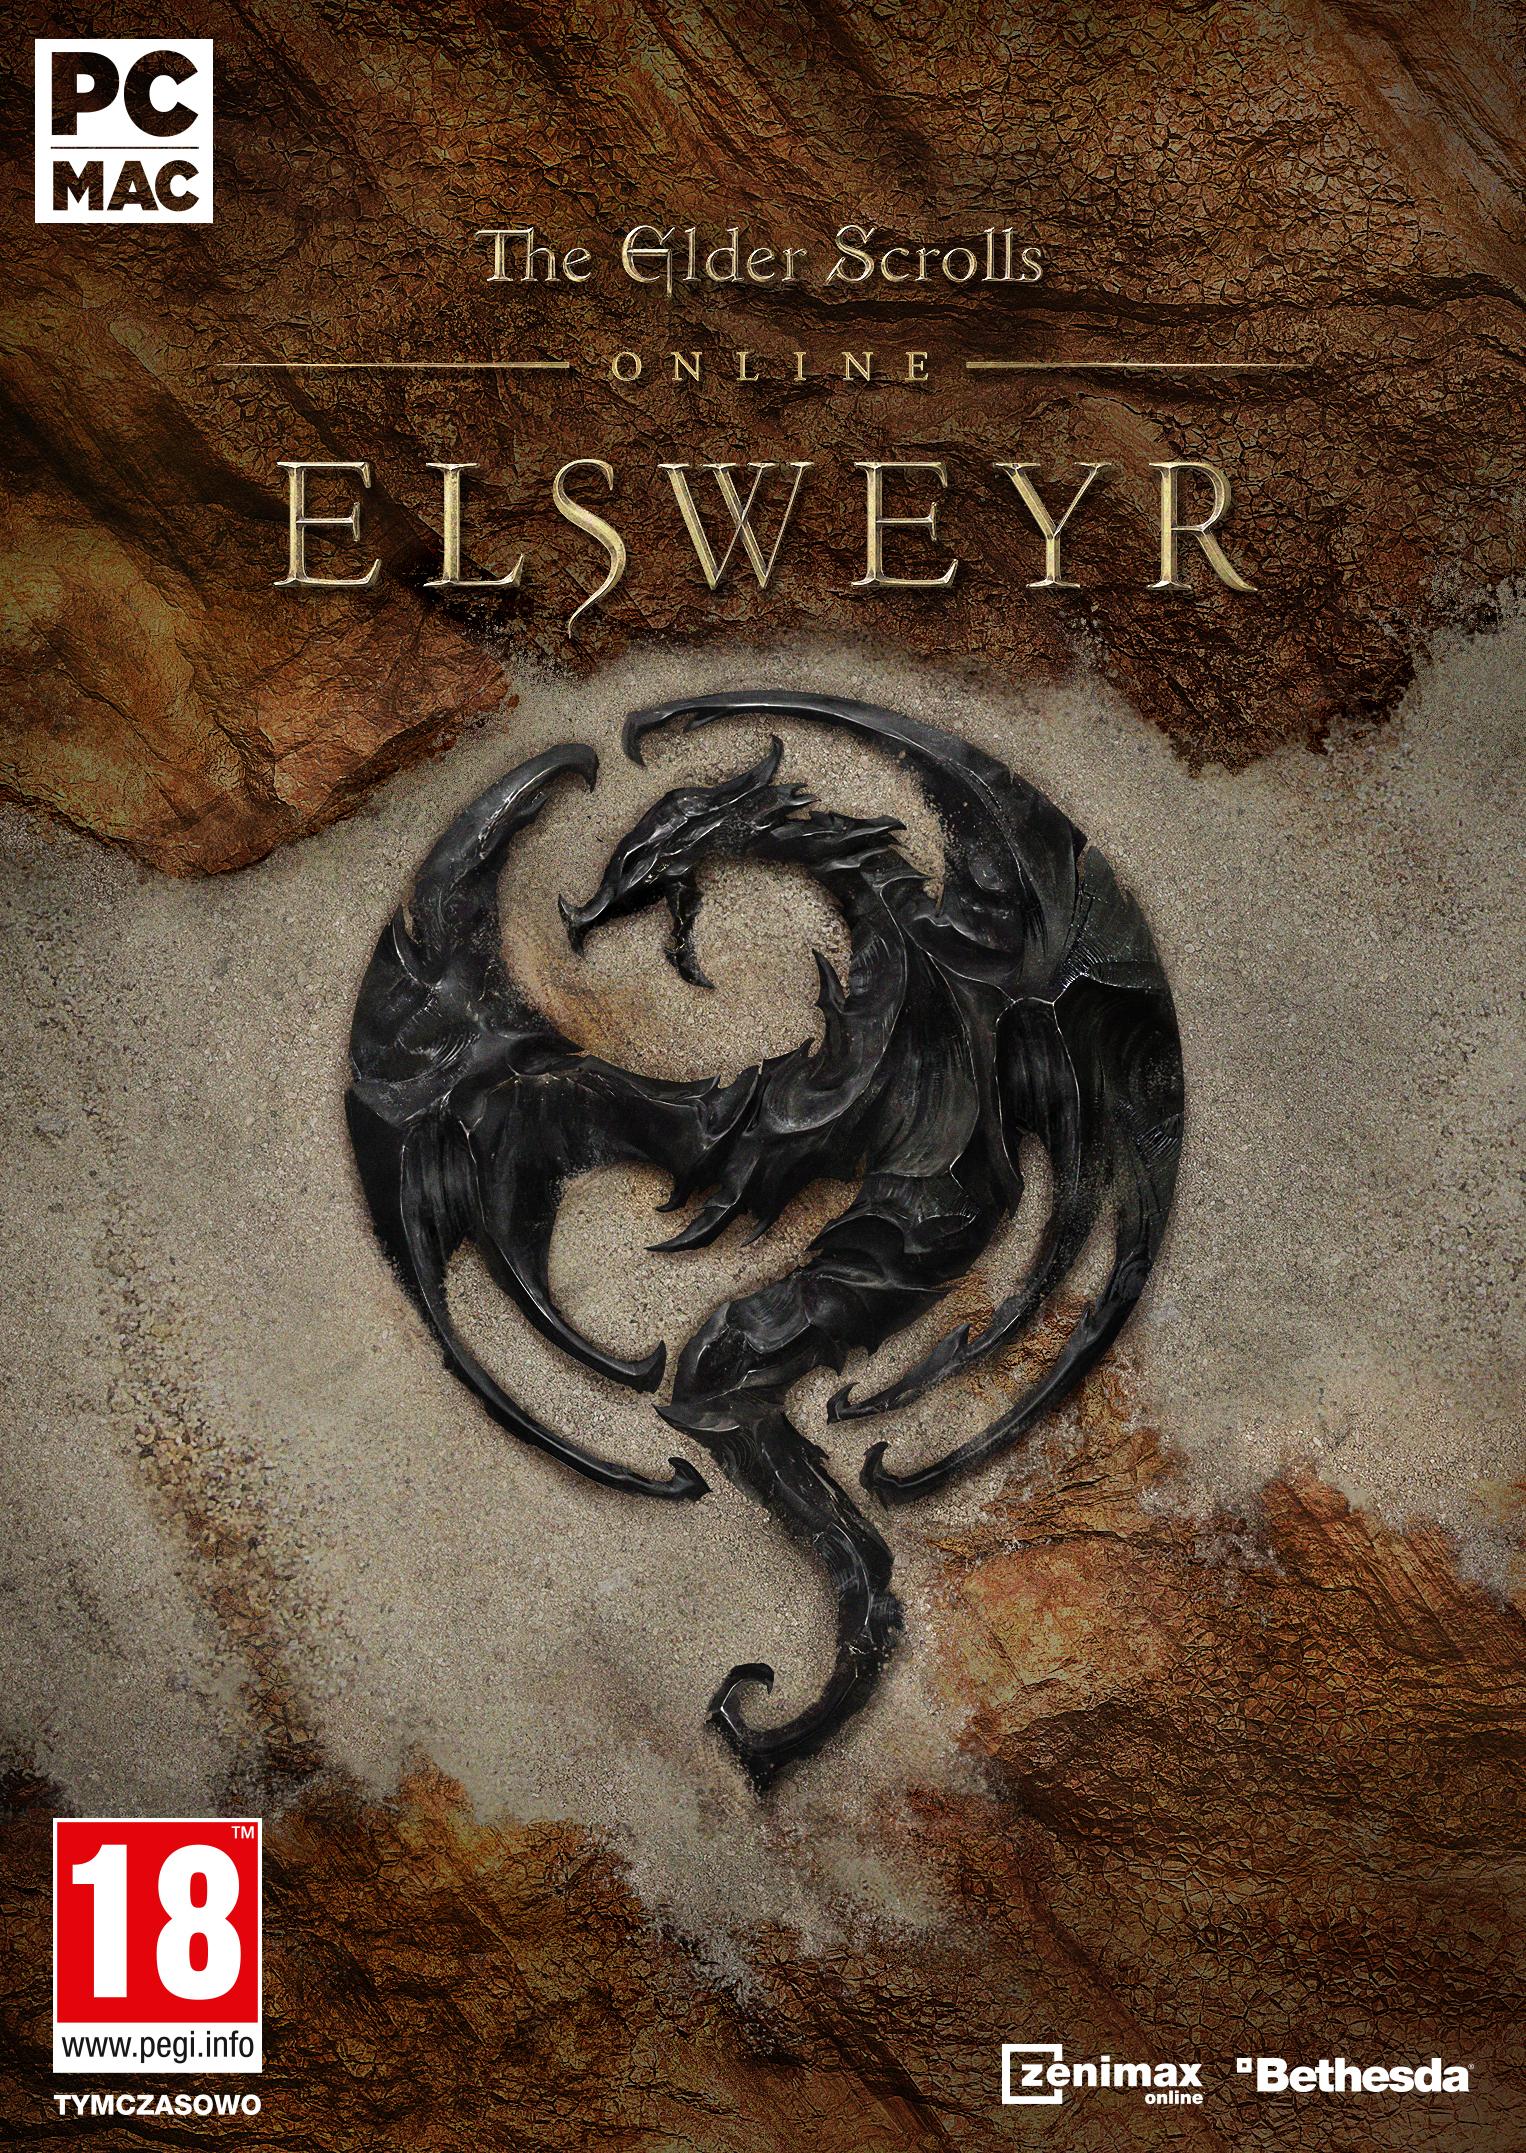 The Elder Scrolls Online - Elsweyr Collector's Edition Upgrade (PC/MAC) DIGITÁLIS